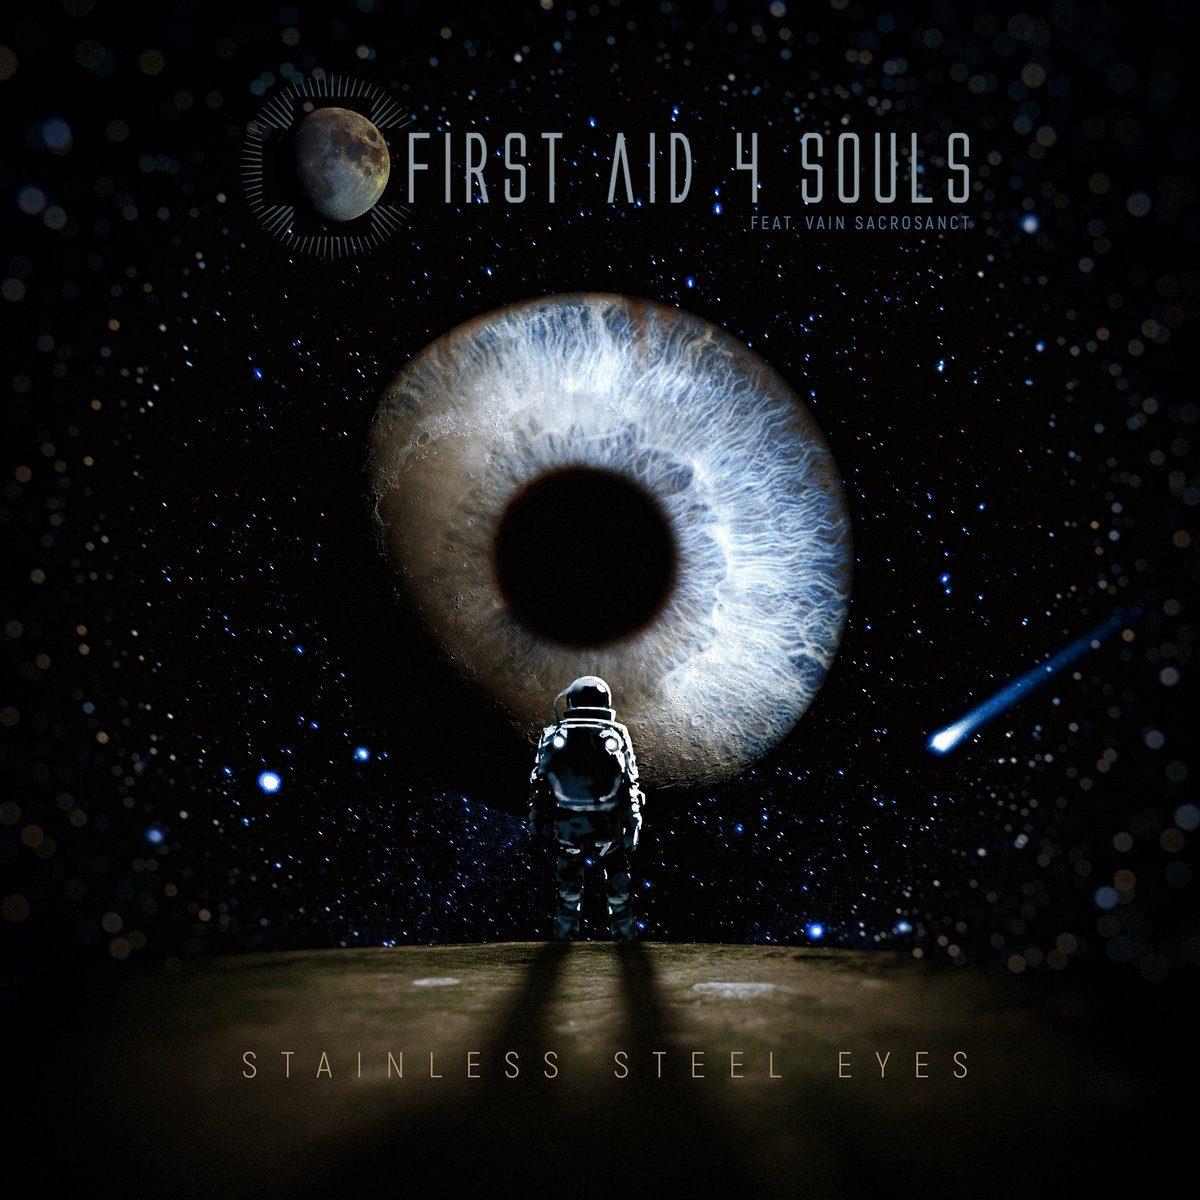 Dark electro act First Aid 4 Souls lands new album: 'Stainless Steel Eyes' feat. Causenation singer Vain Sacrosanct